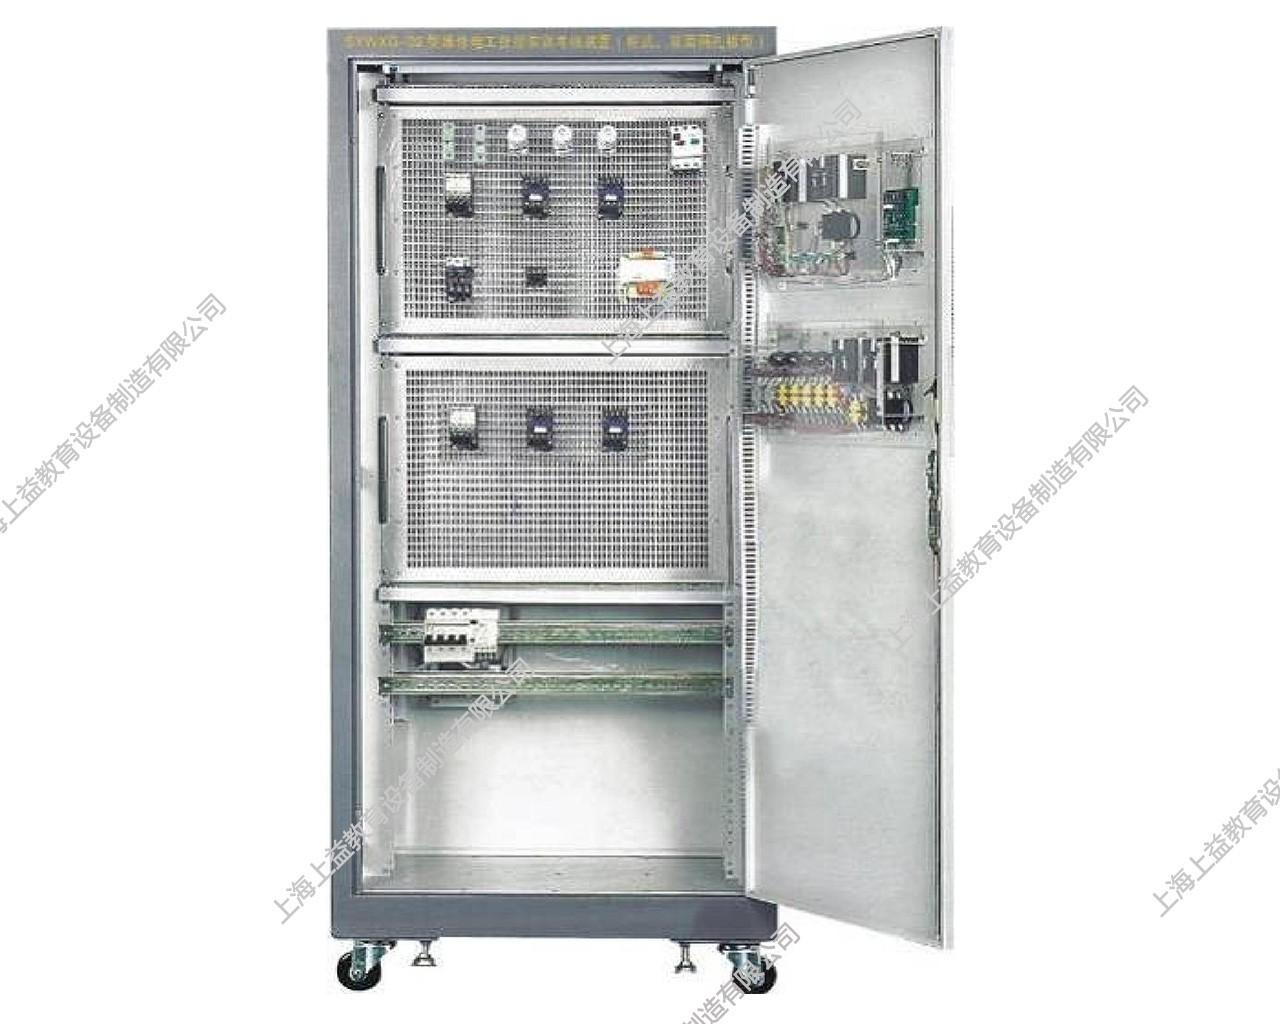 SYWXG-02维修电工技能wwwlehu8viplehu68vip装置(柜式、双面网孔板型)